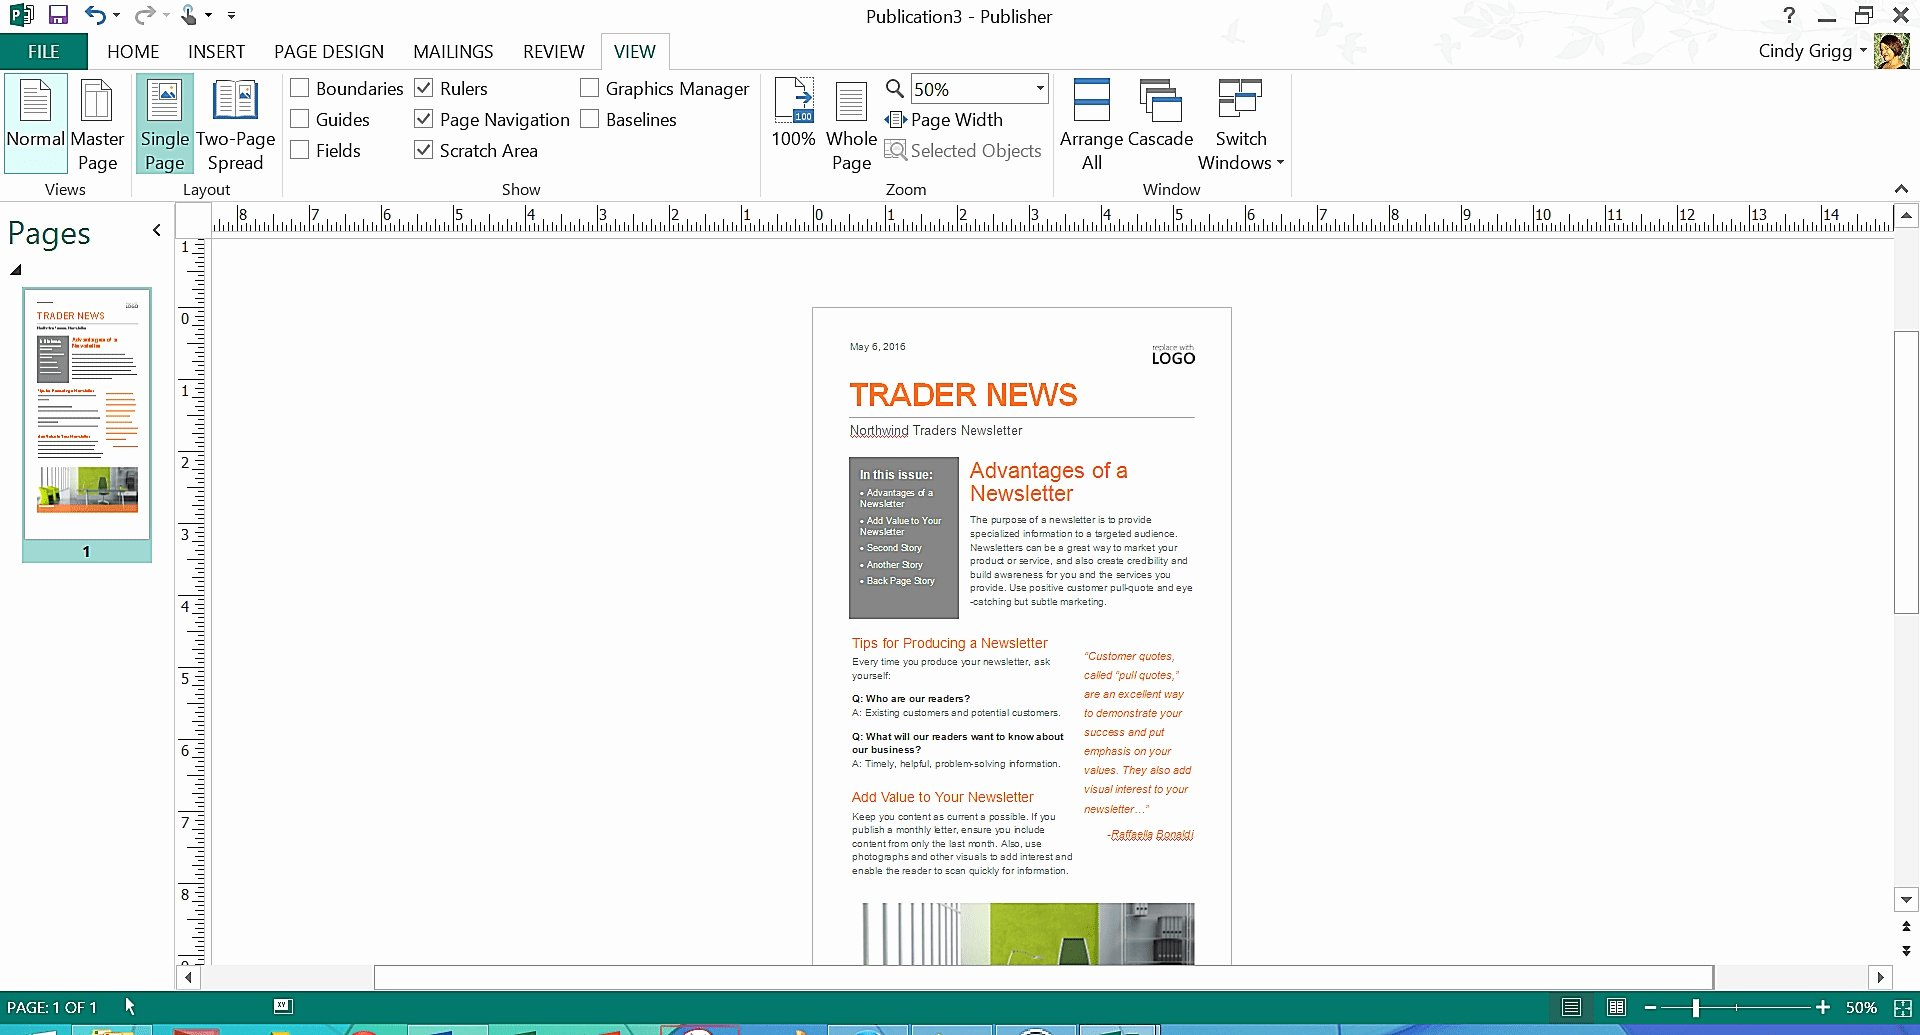 Microsoft Publisher Website Template Luxury Microsoft Publisher Website Templates Free Download Best